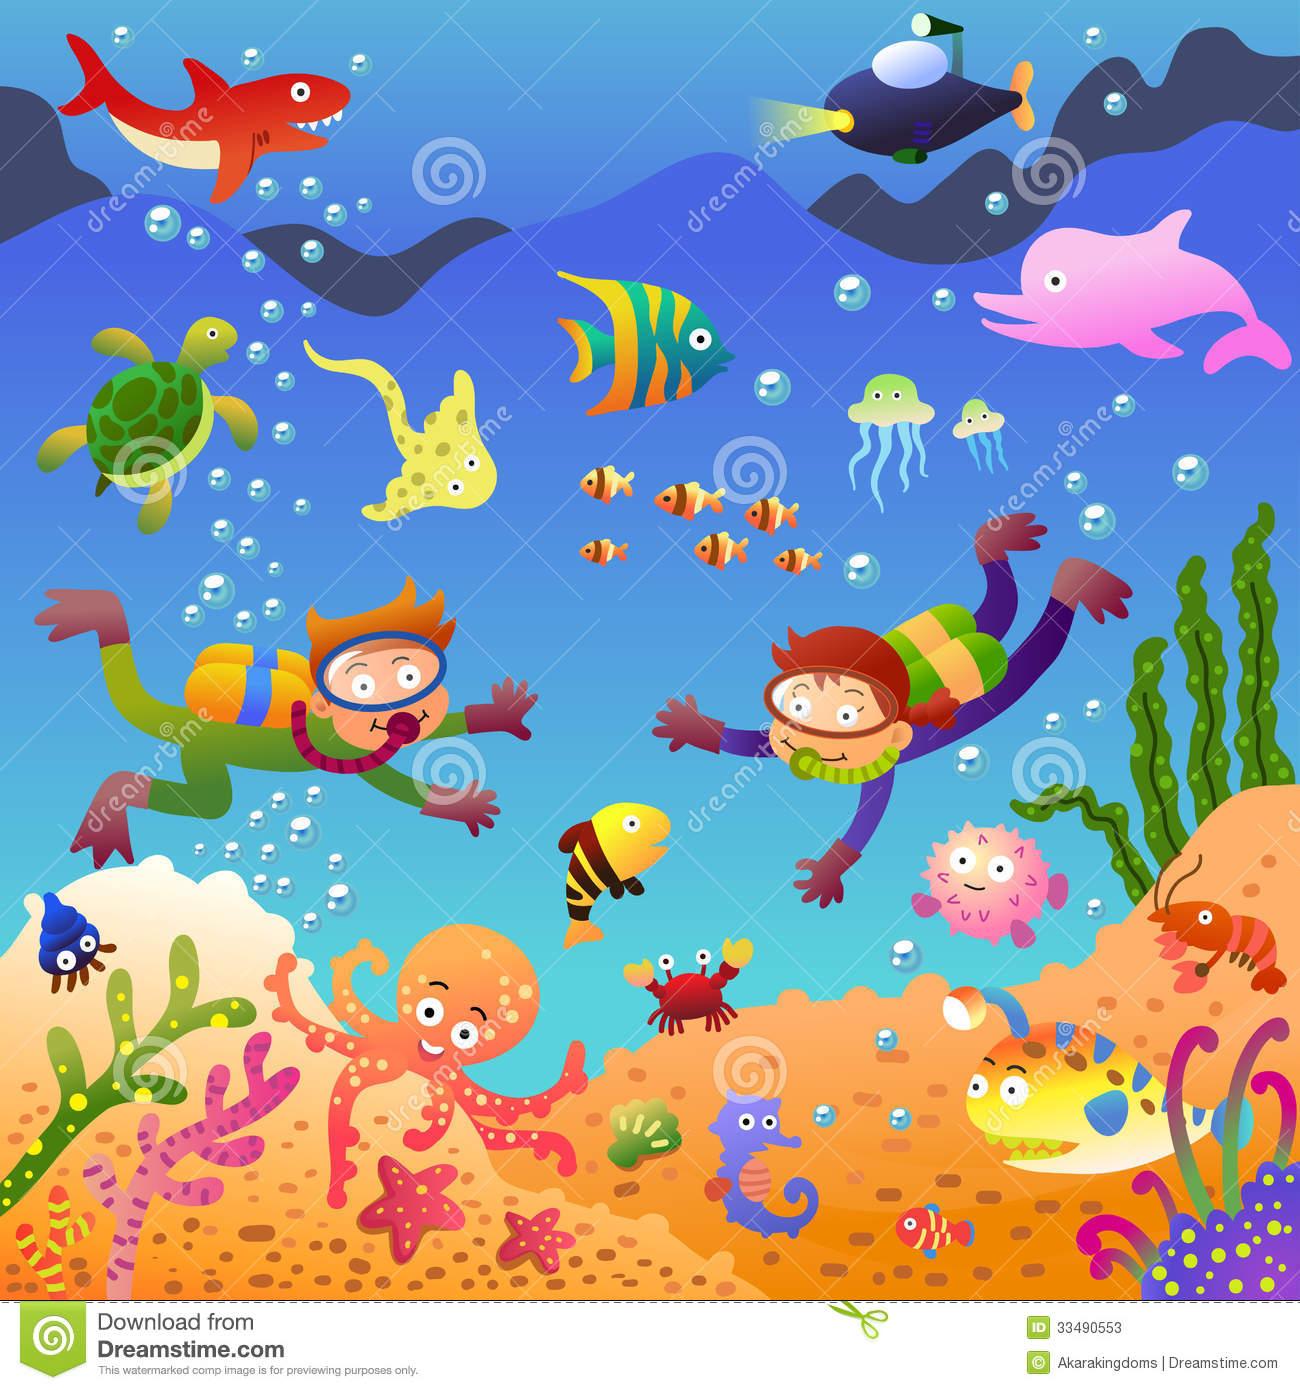 Under sea clipart vector free download 9+ Under The Sea Clipart | ClipartLook vector free download